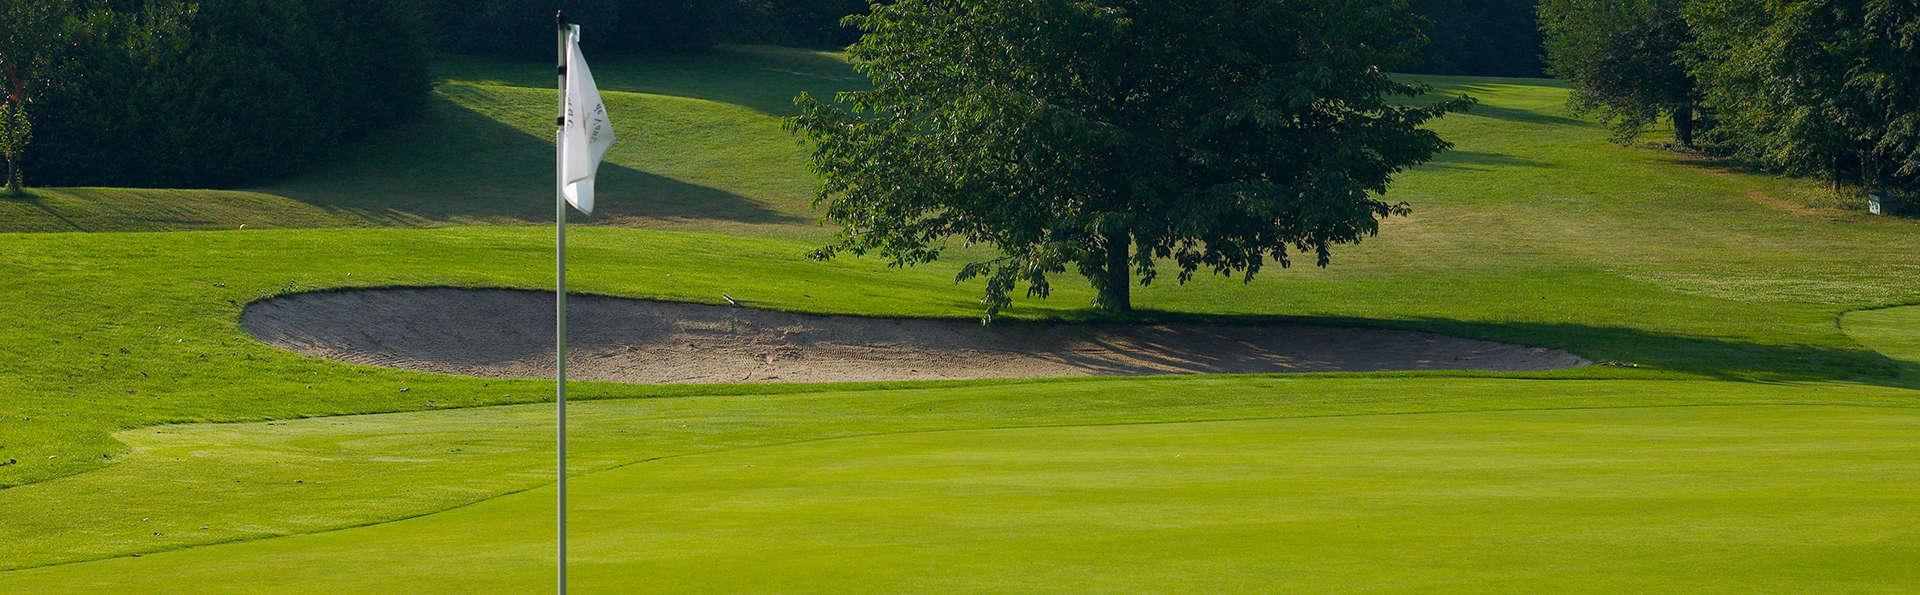 Domaine et Golf de Vaugouard - edit_golf.jpg